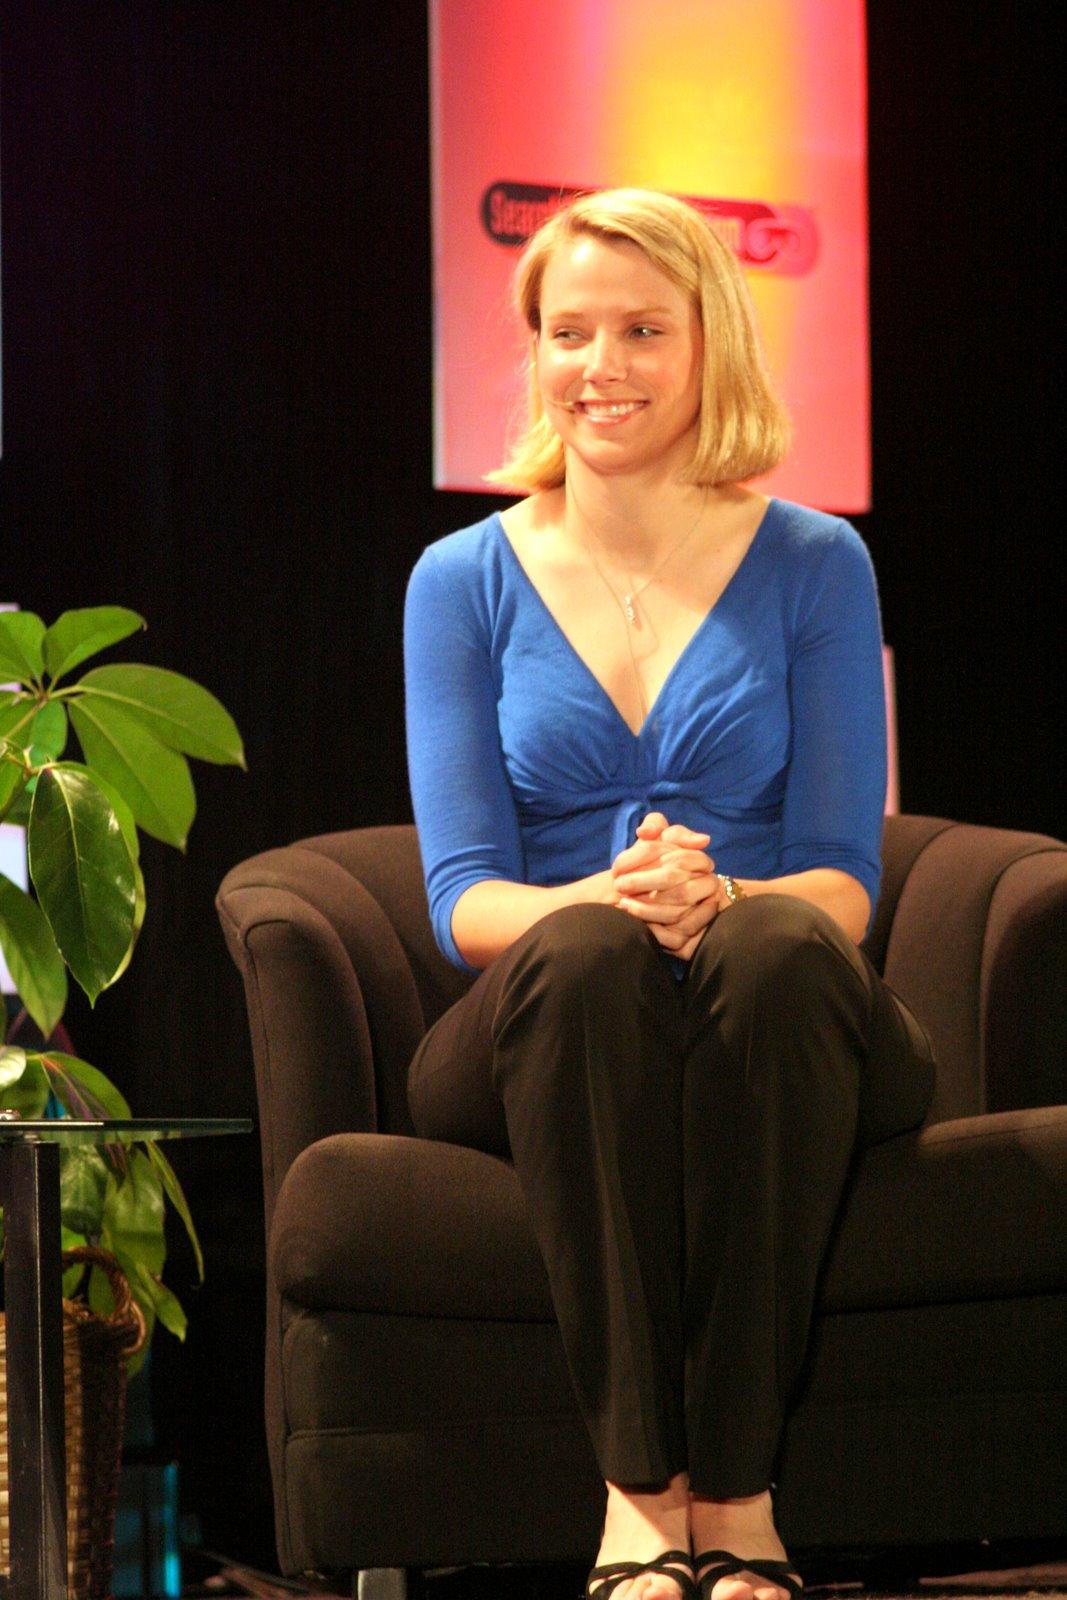 http://3.bp.blogspot.com/-Wt7wWiS8oc4/ThW4foH4X8I/AAAAAAAAMSY/y6veK77KcUA/s1600/Marissa_Mayer-google-8.JPG